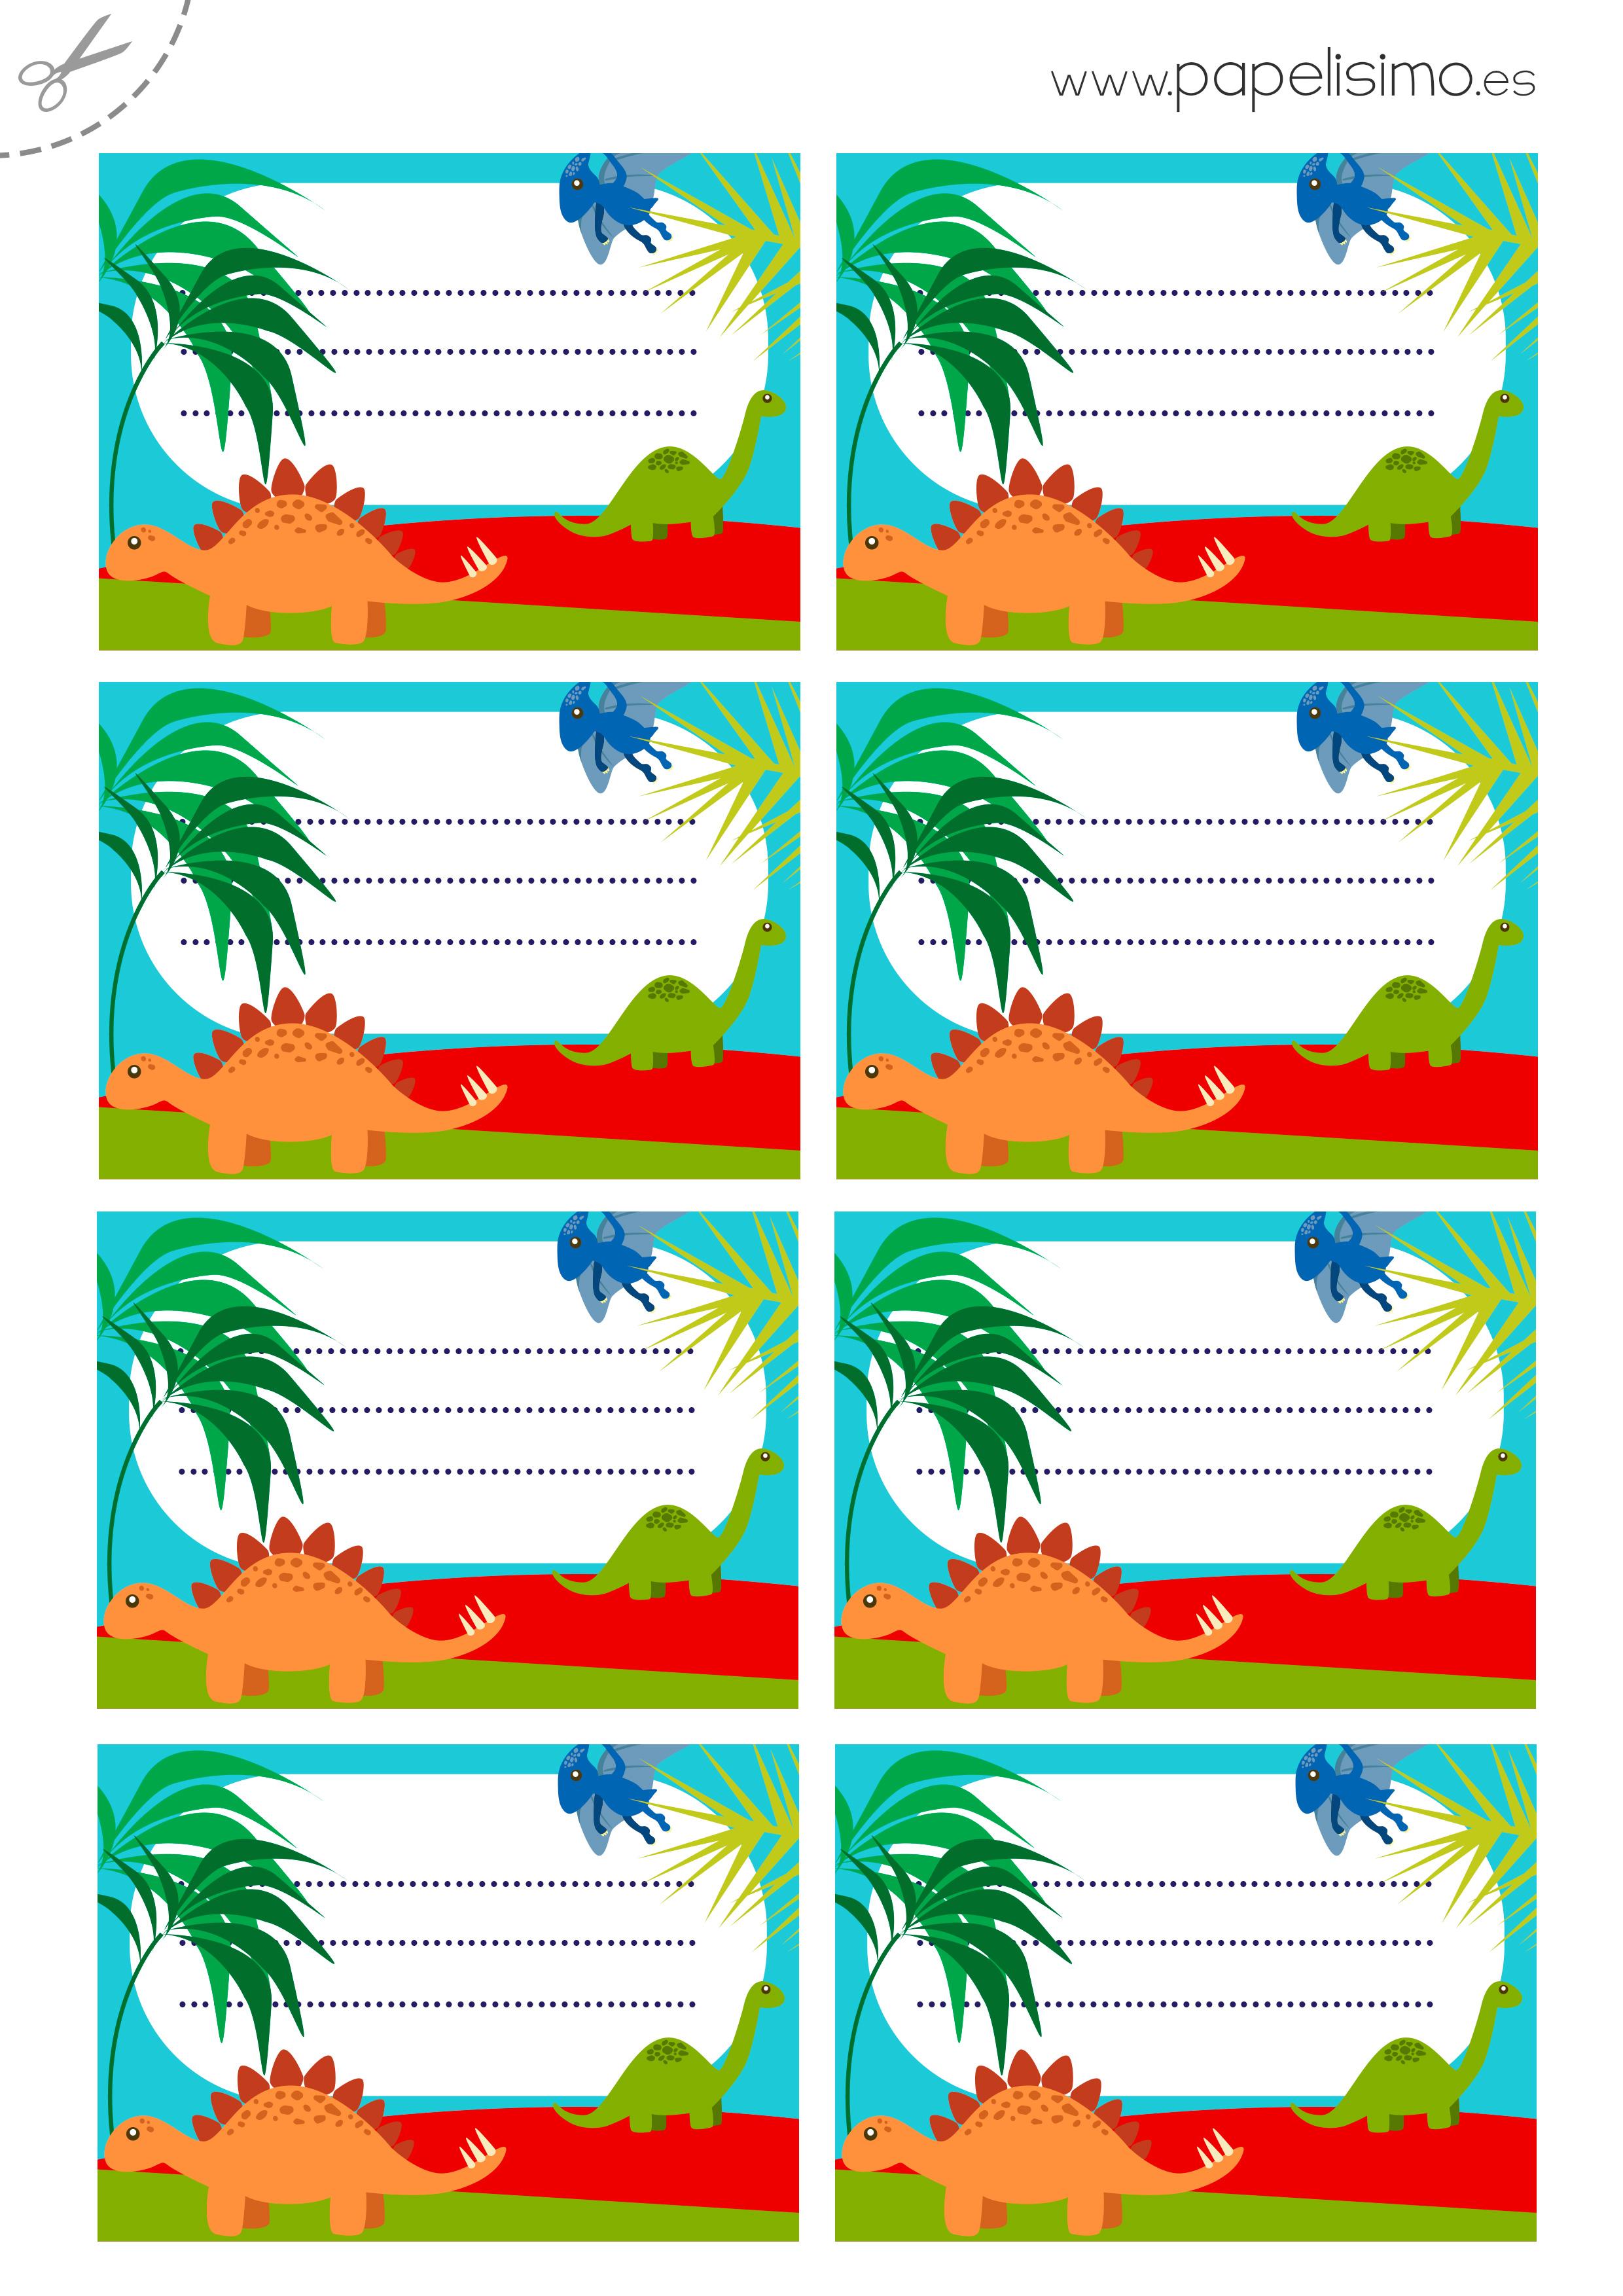 Moderno Libros Para Niños Imprimibles Elaboración - Dibujos Para ...